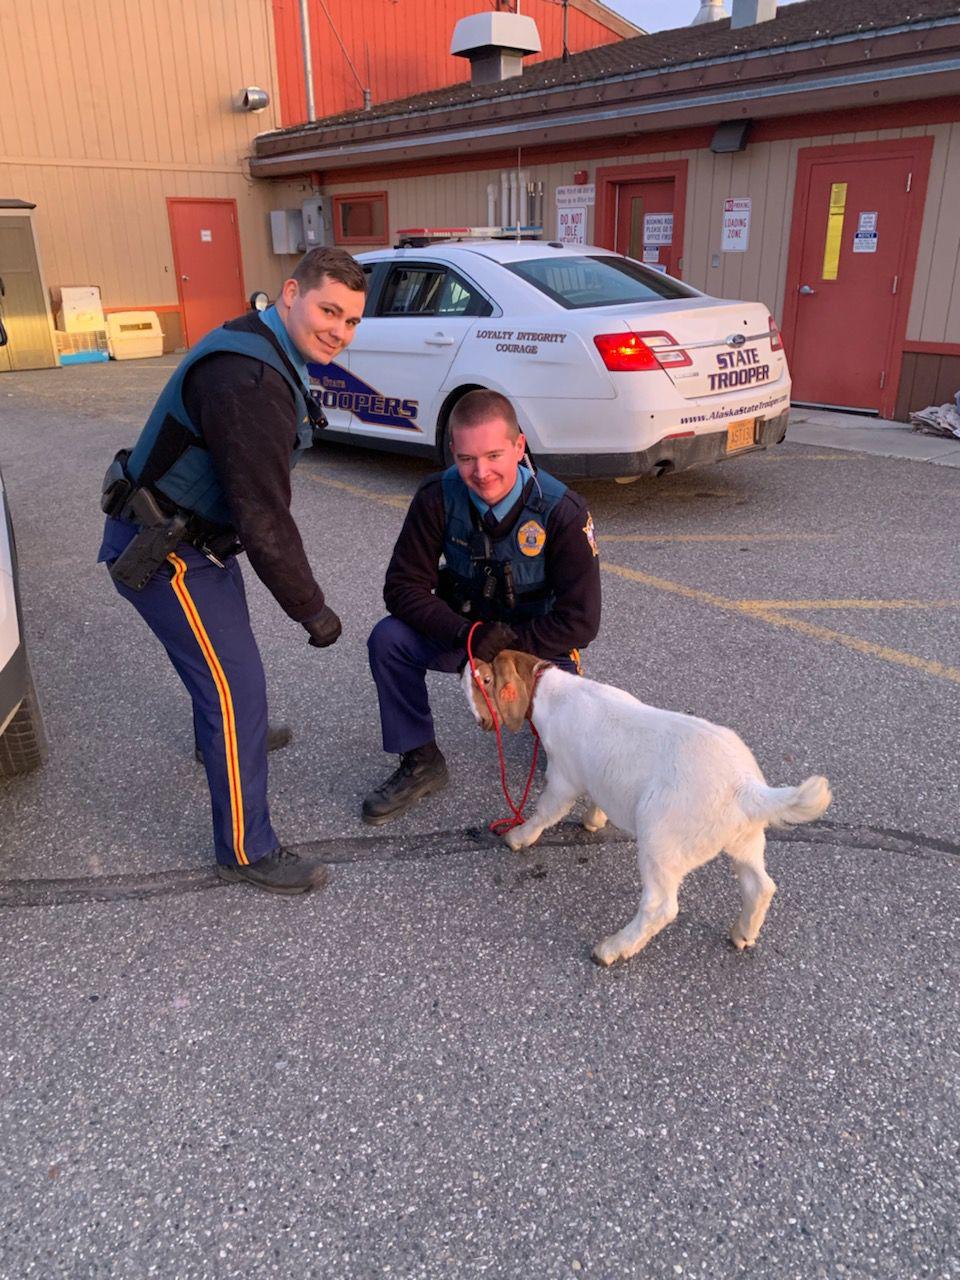 Goat captured